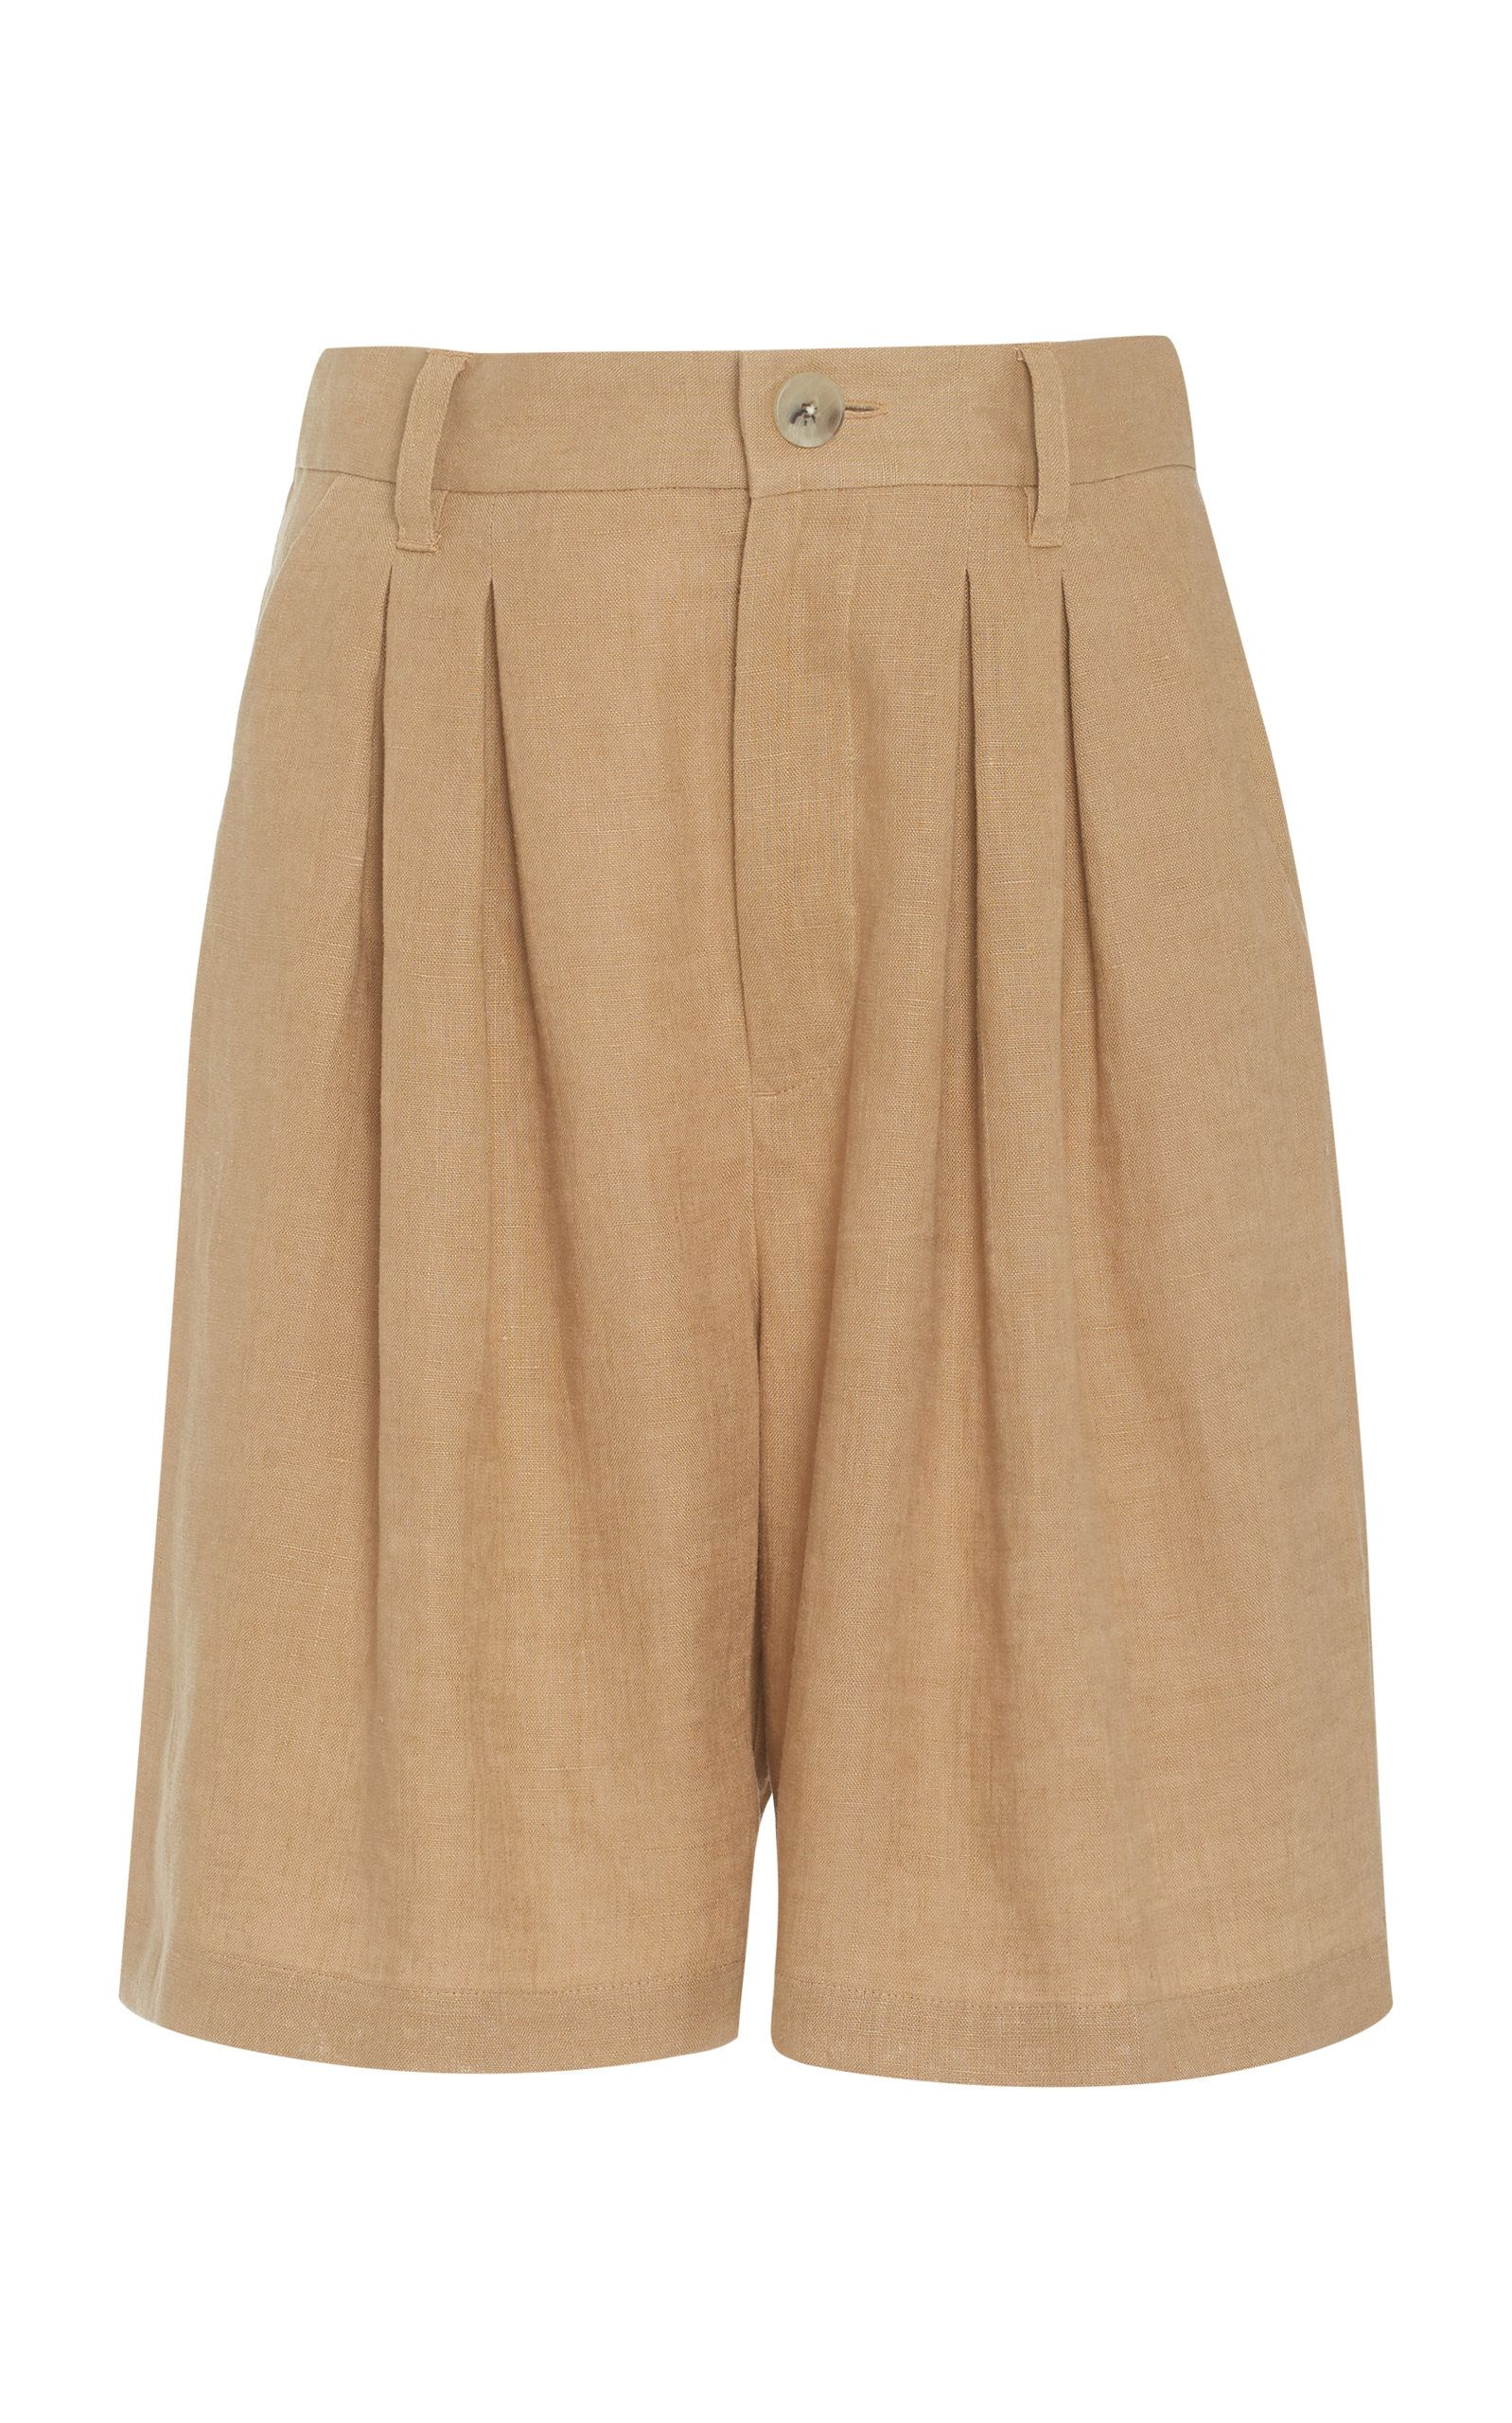 best new fashion items 286246 1629963683485